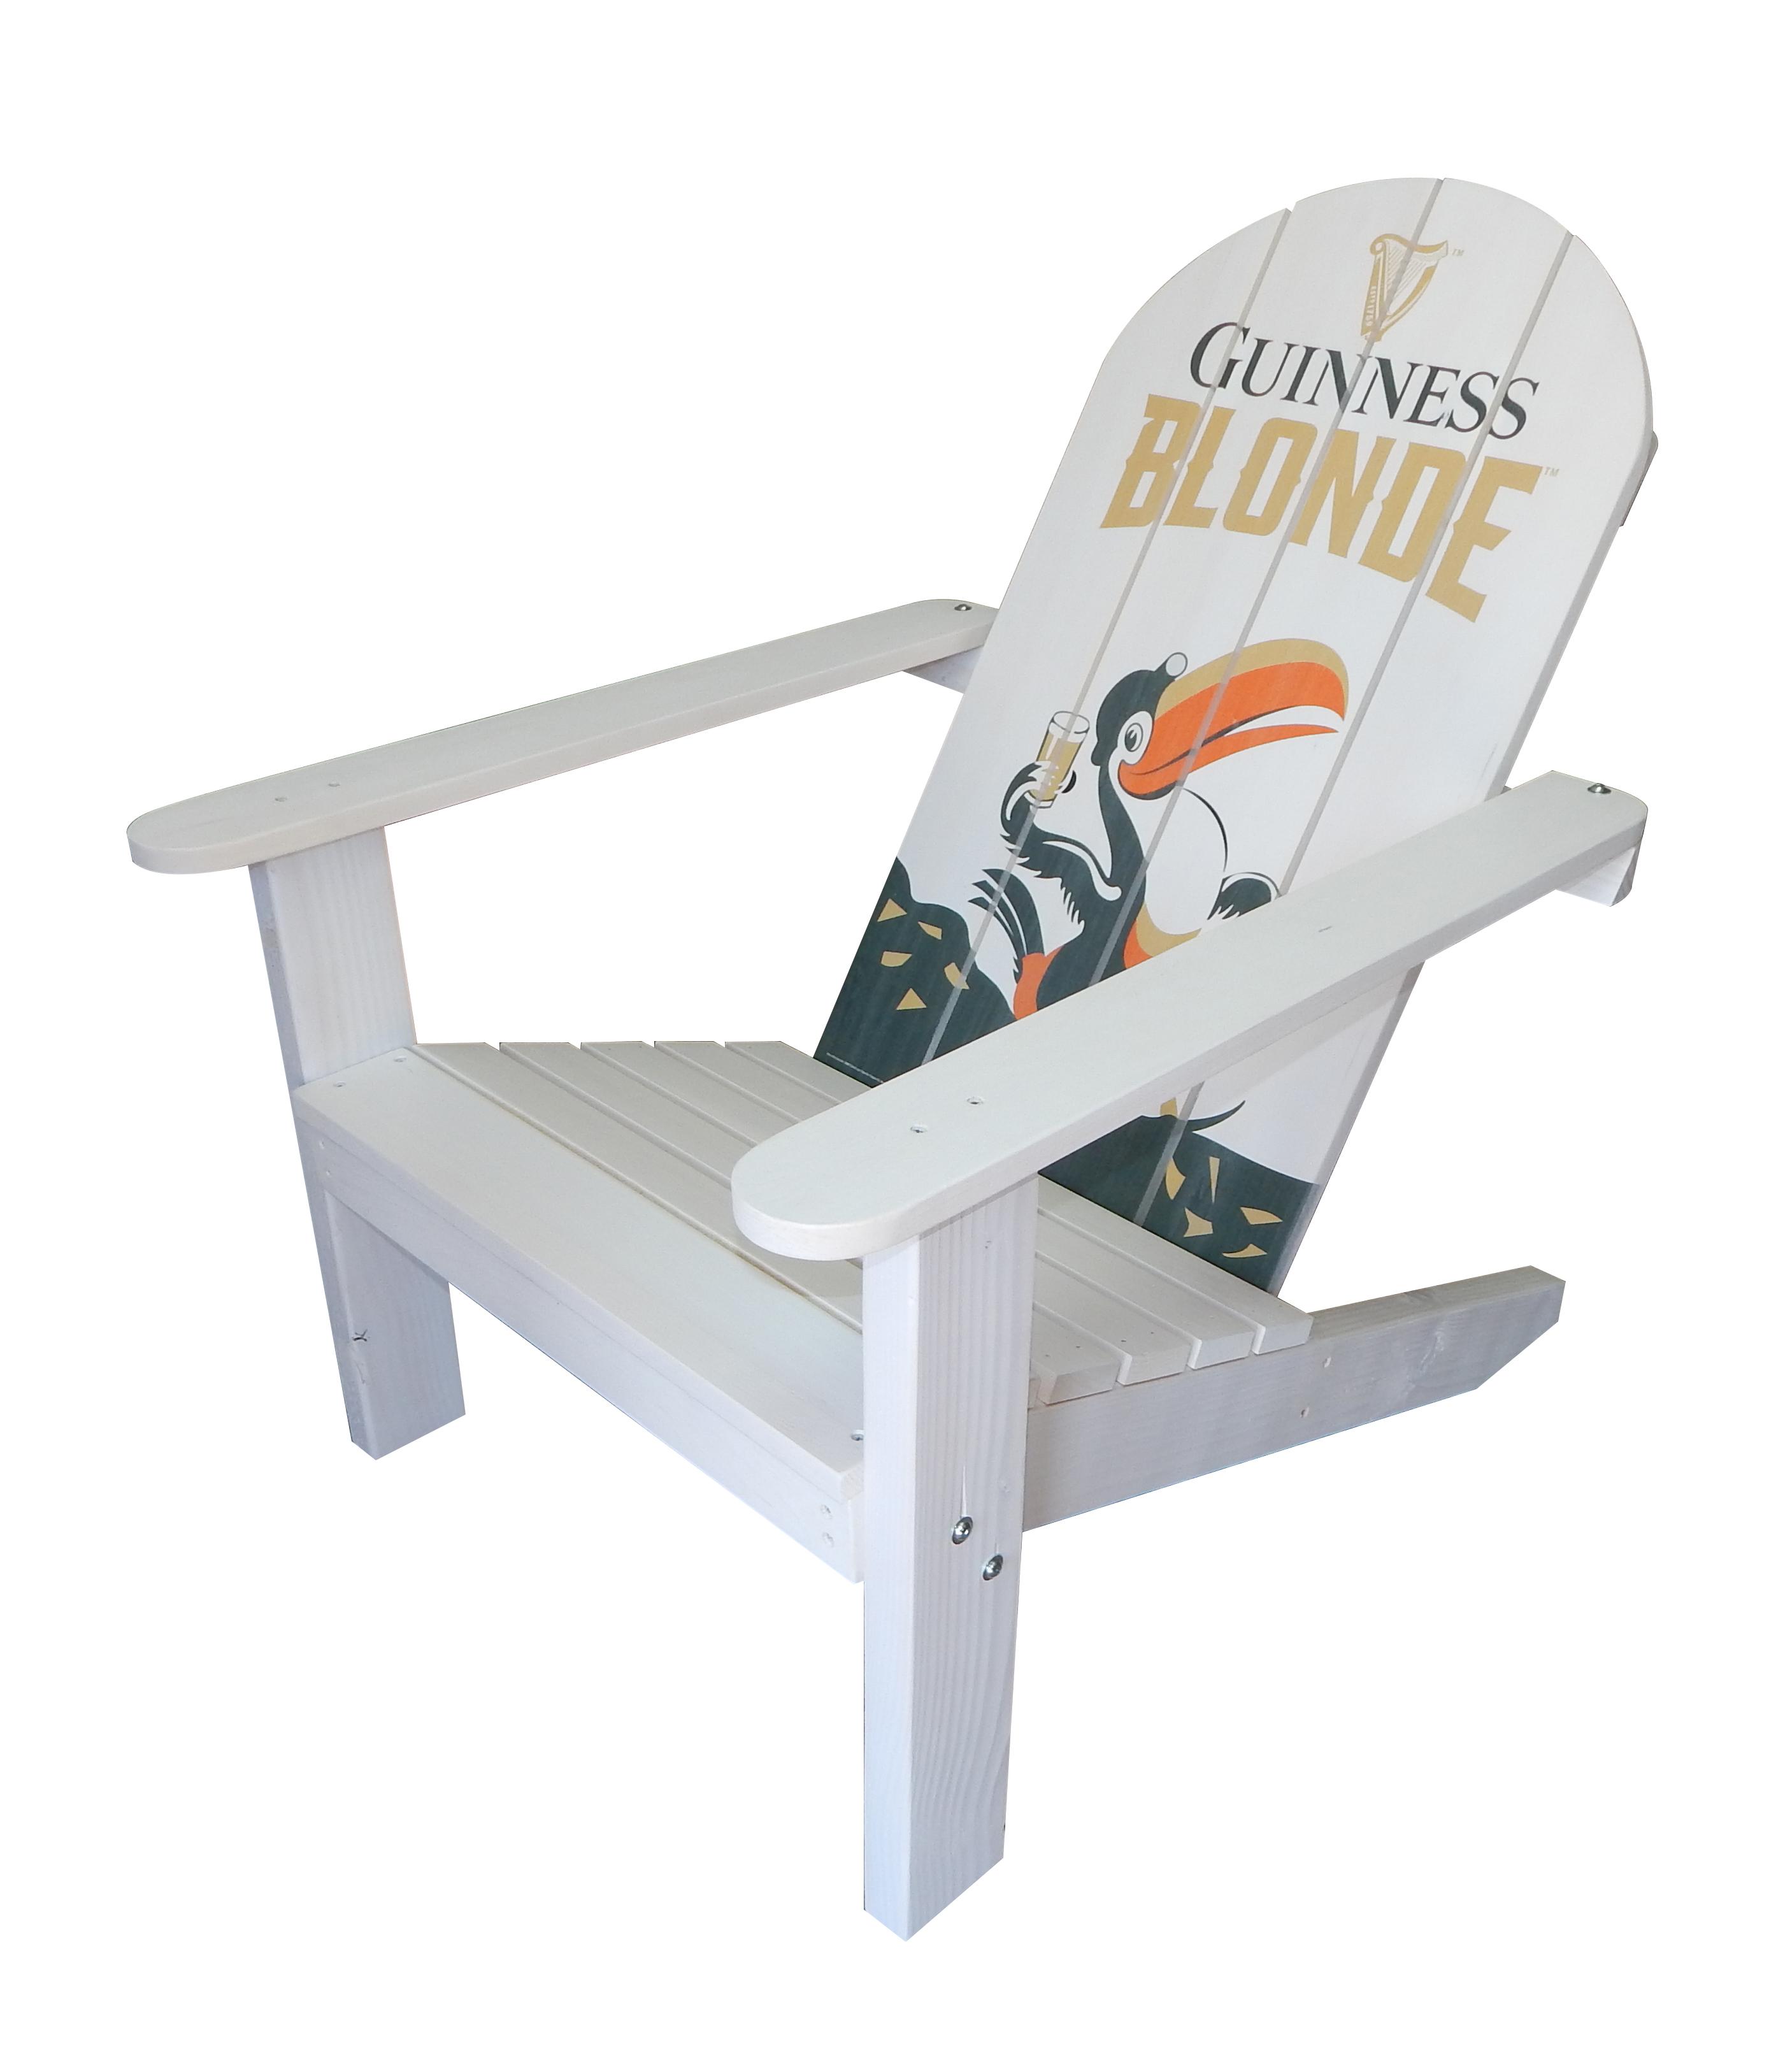 Guinness Blonde Adirondack Chair